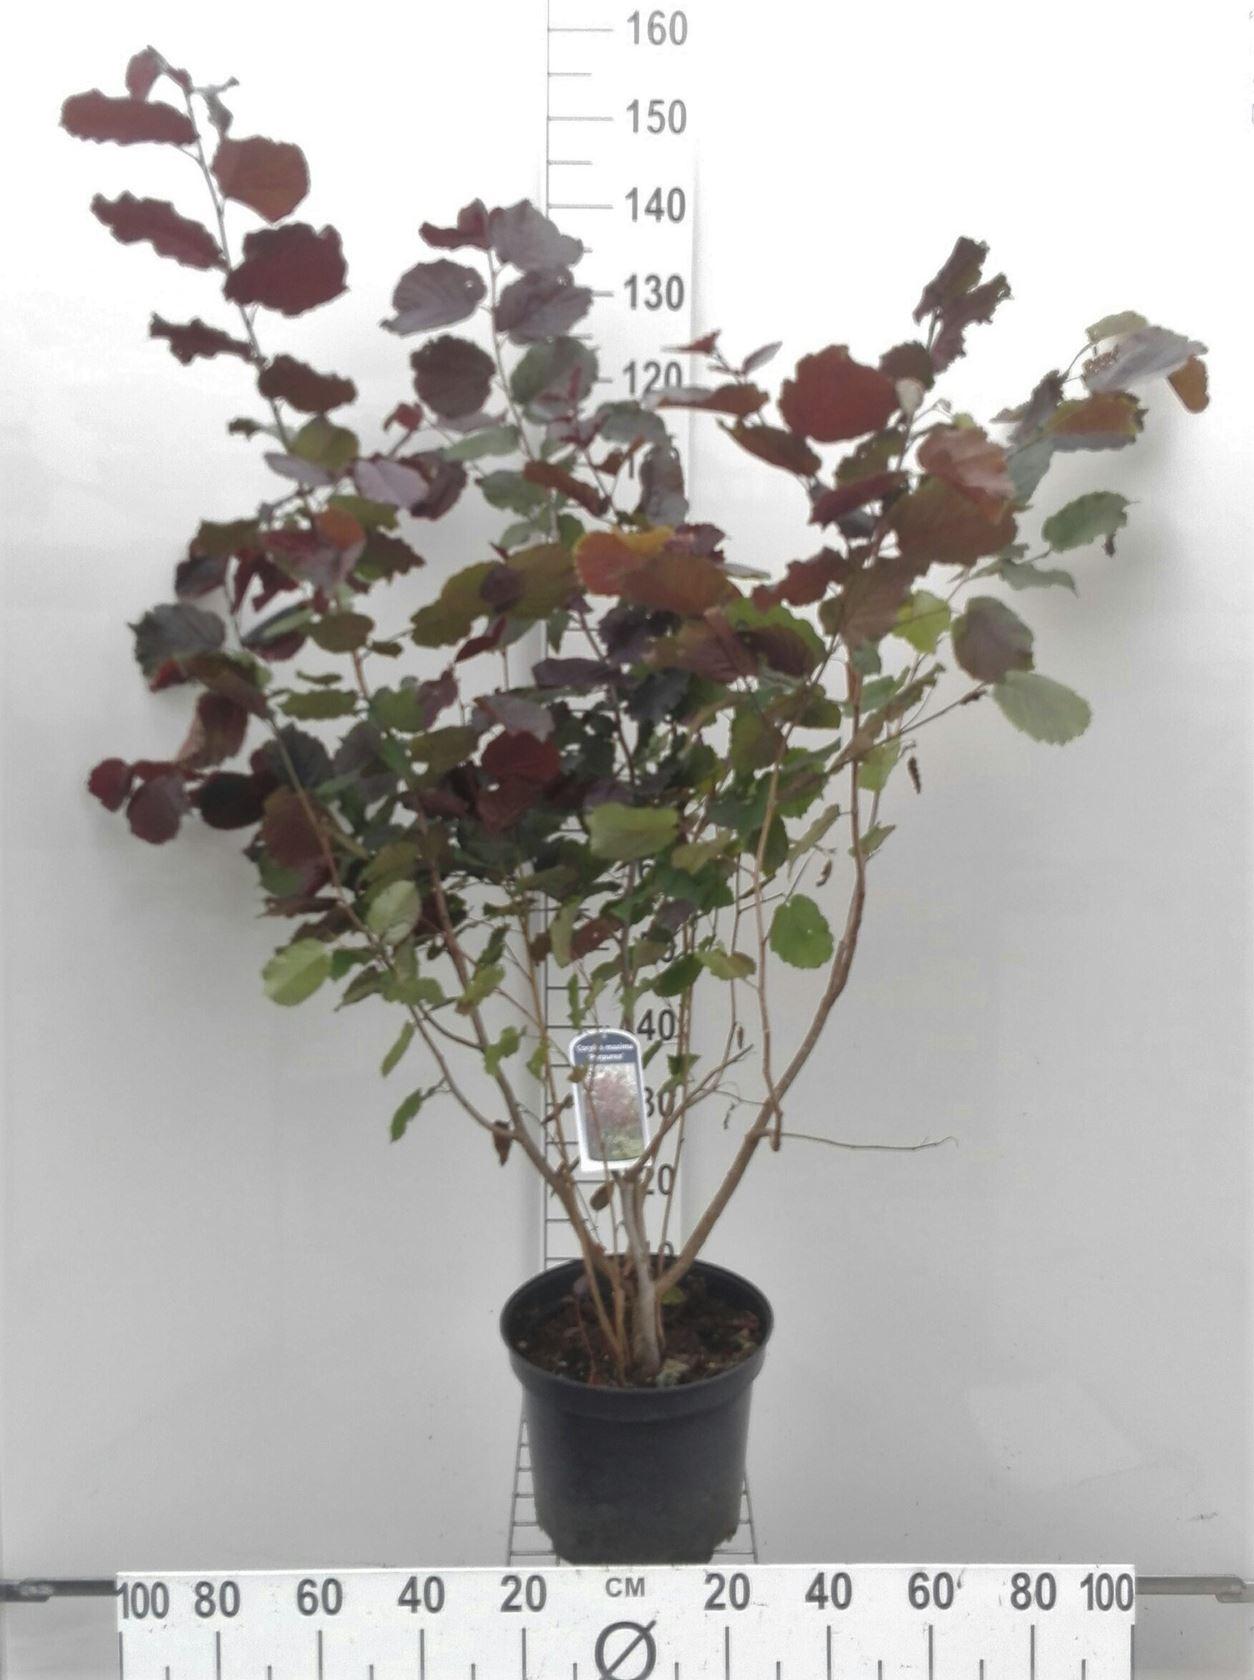 Corylus maxima 'Purpurea' 80-100 cm CO 10L